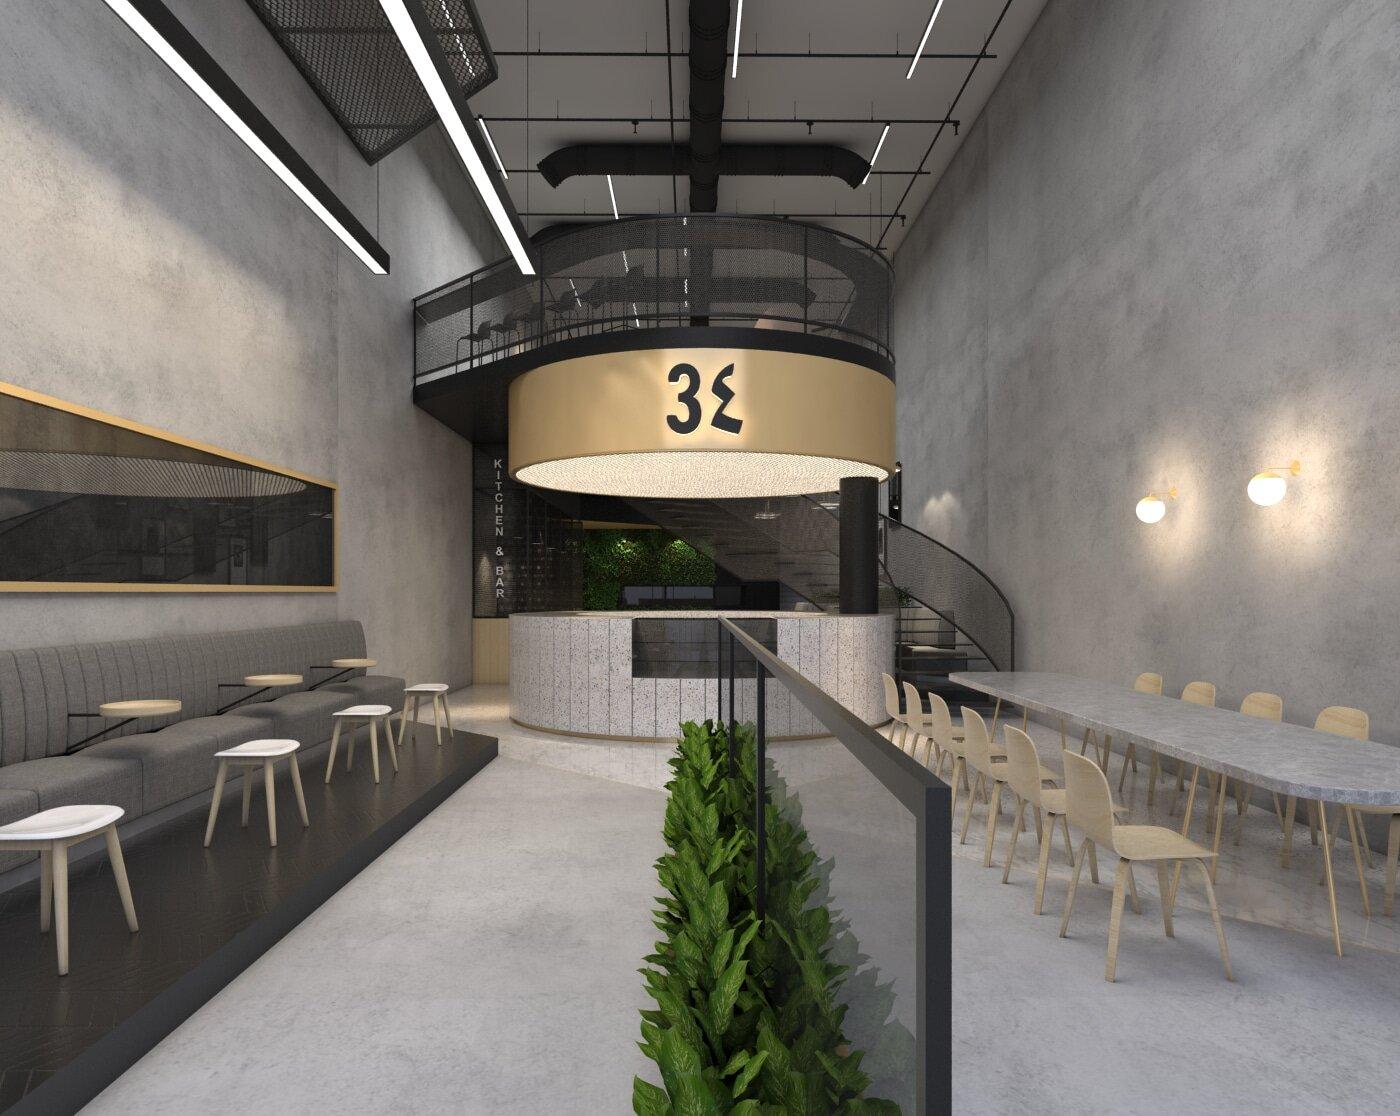 34 cafe 1.jpg